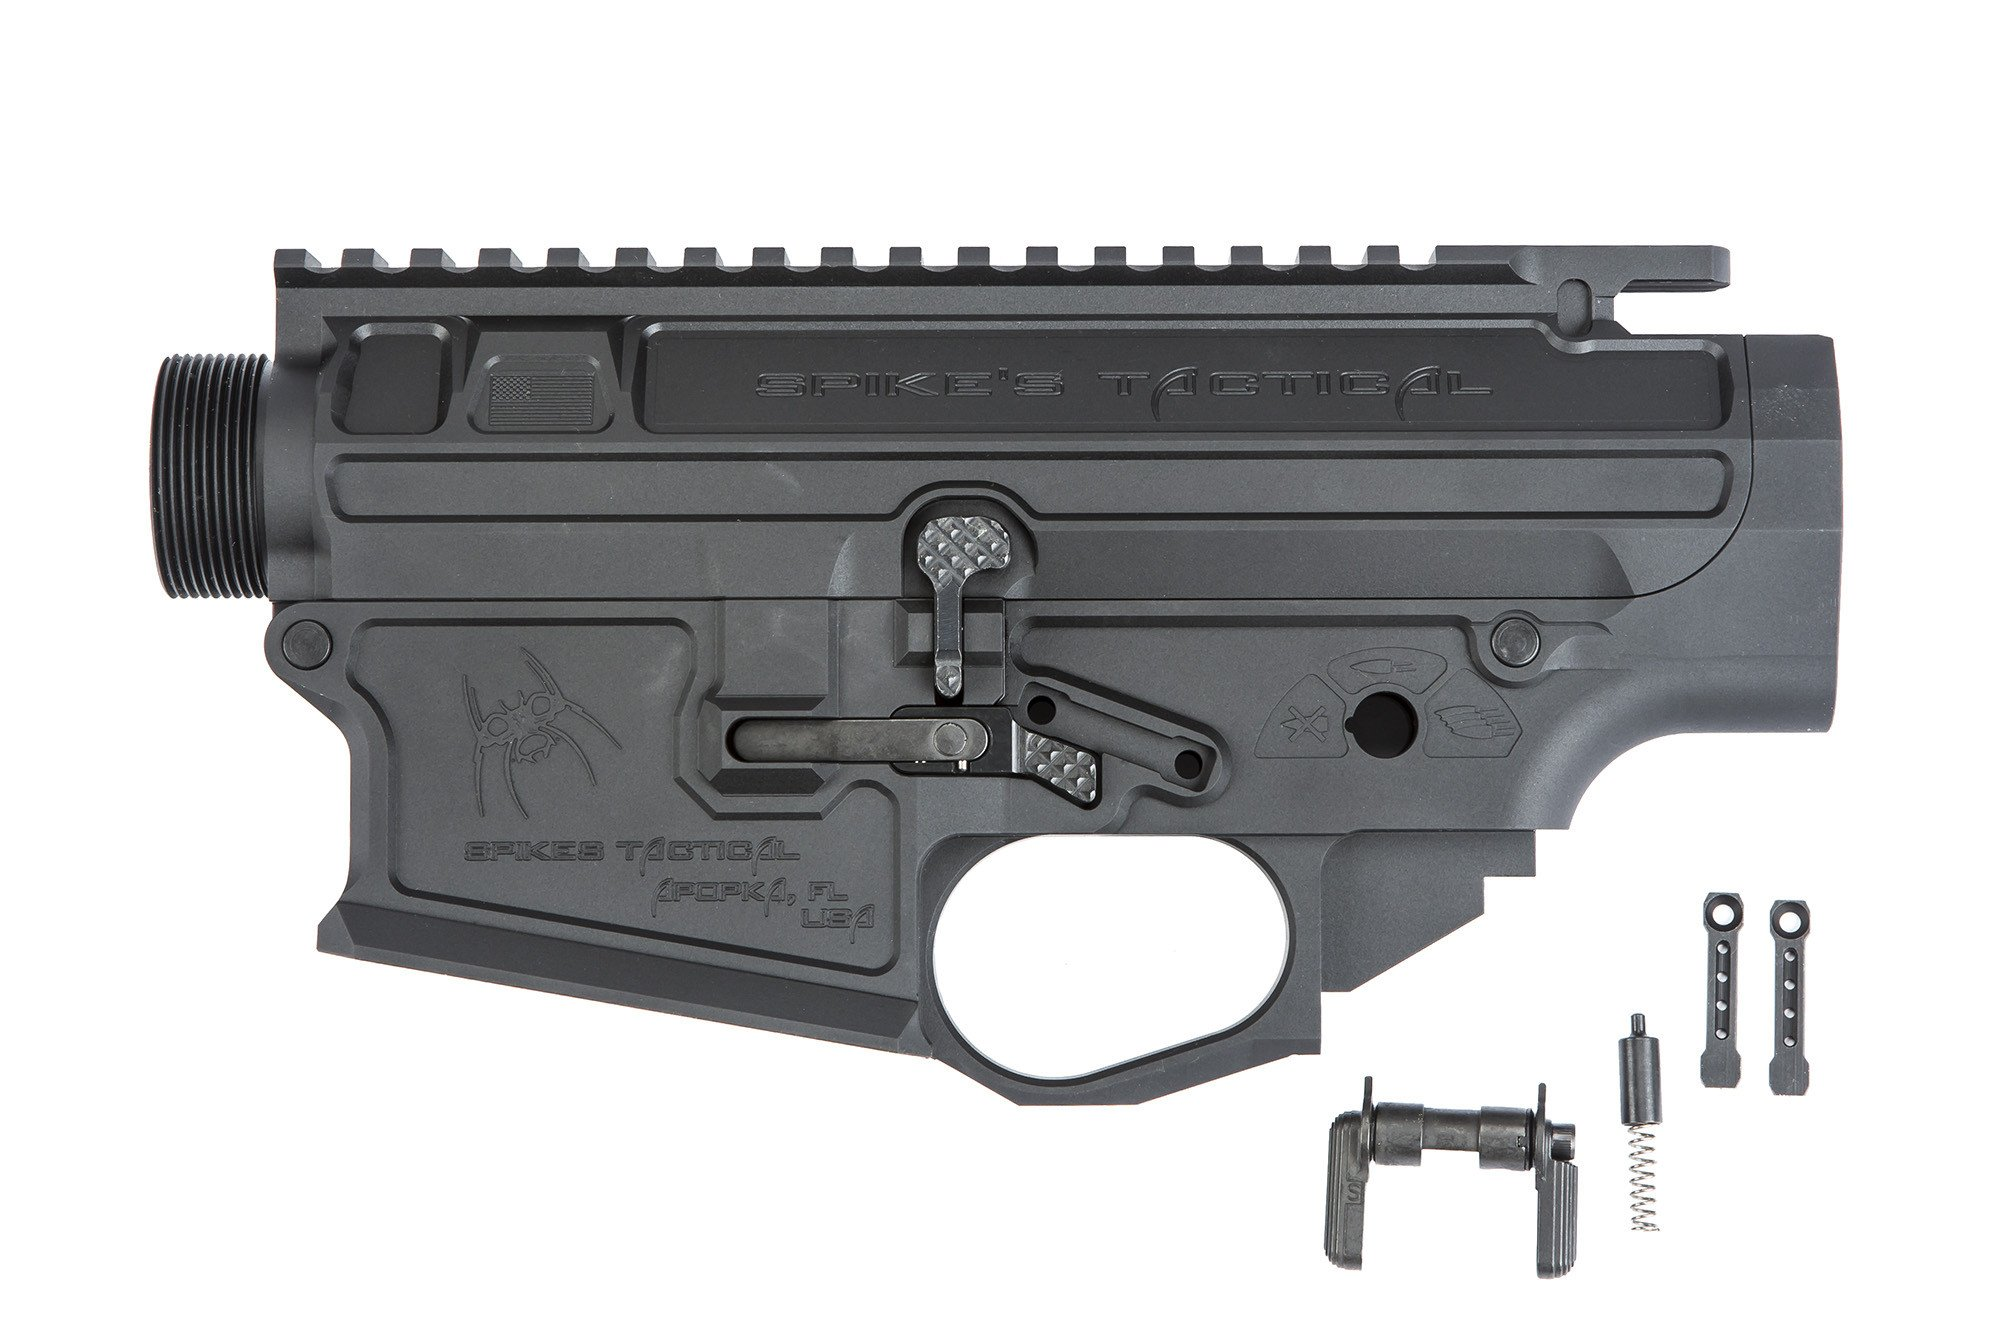 Billet Gen II LR-308 Set